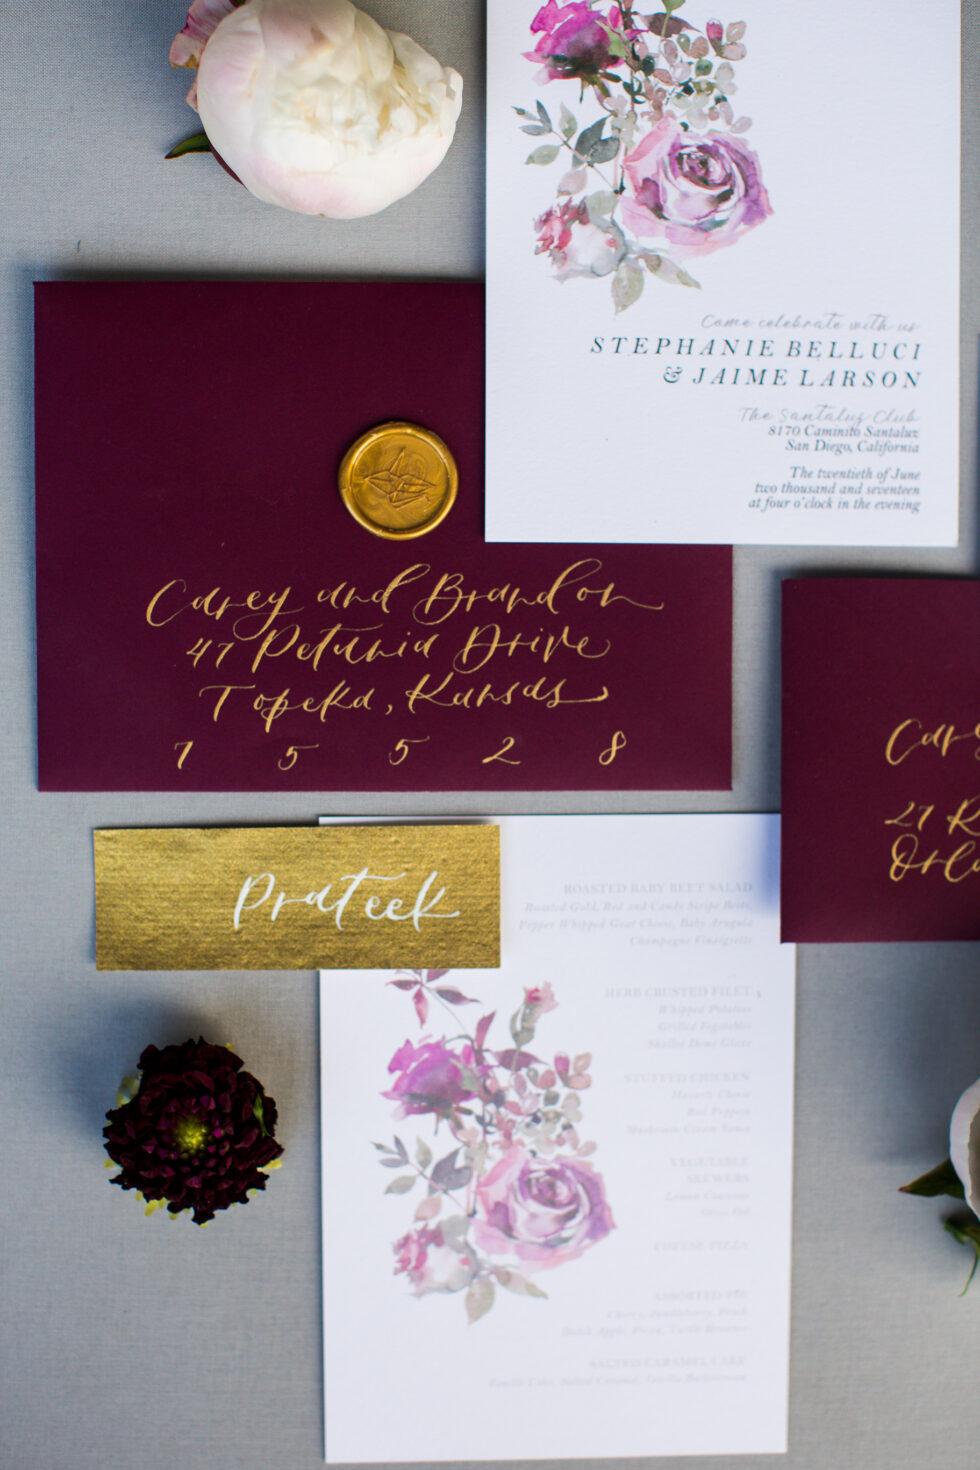 The-Prettiest-Pieces-Fall-Wedding-Winmock-North-Carolina-02